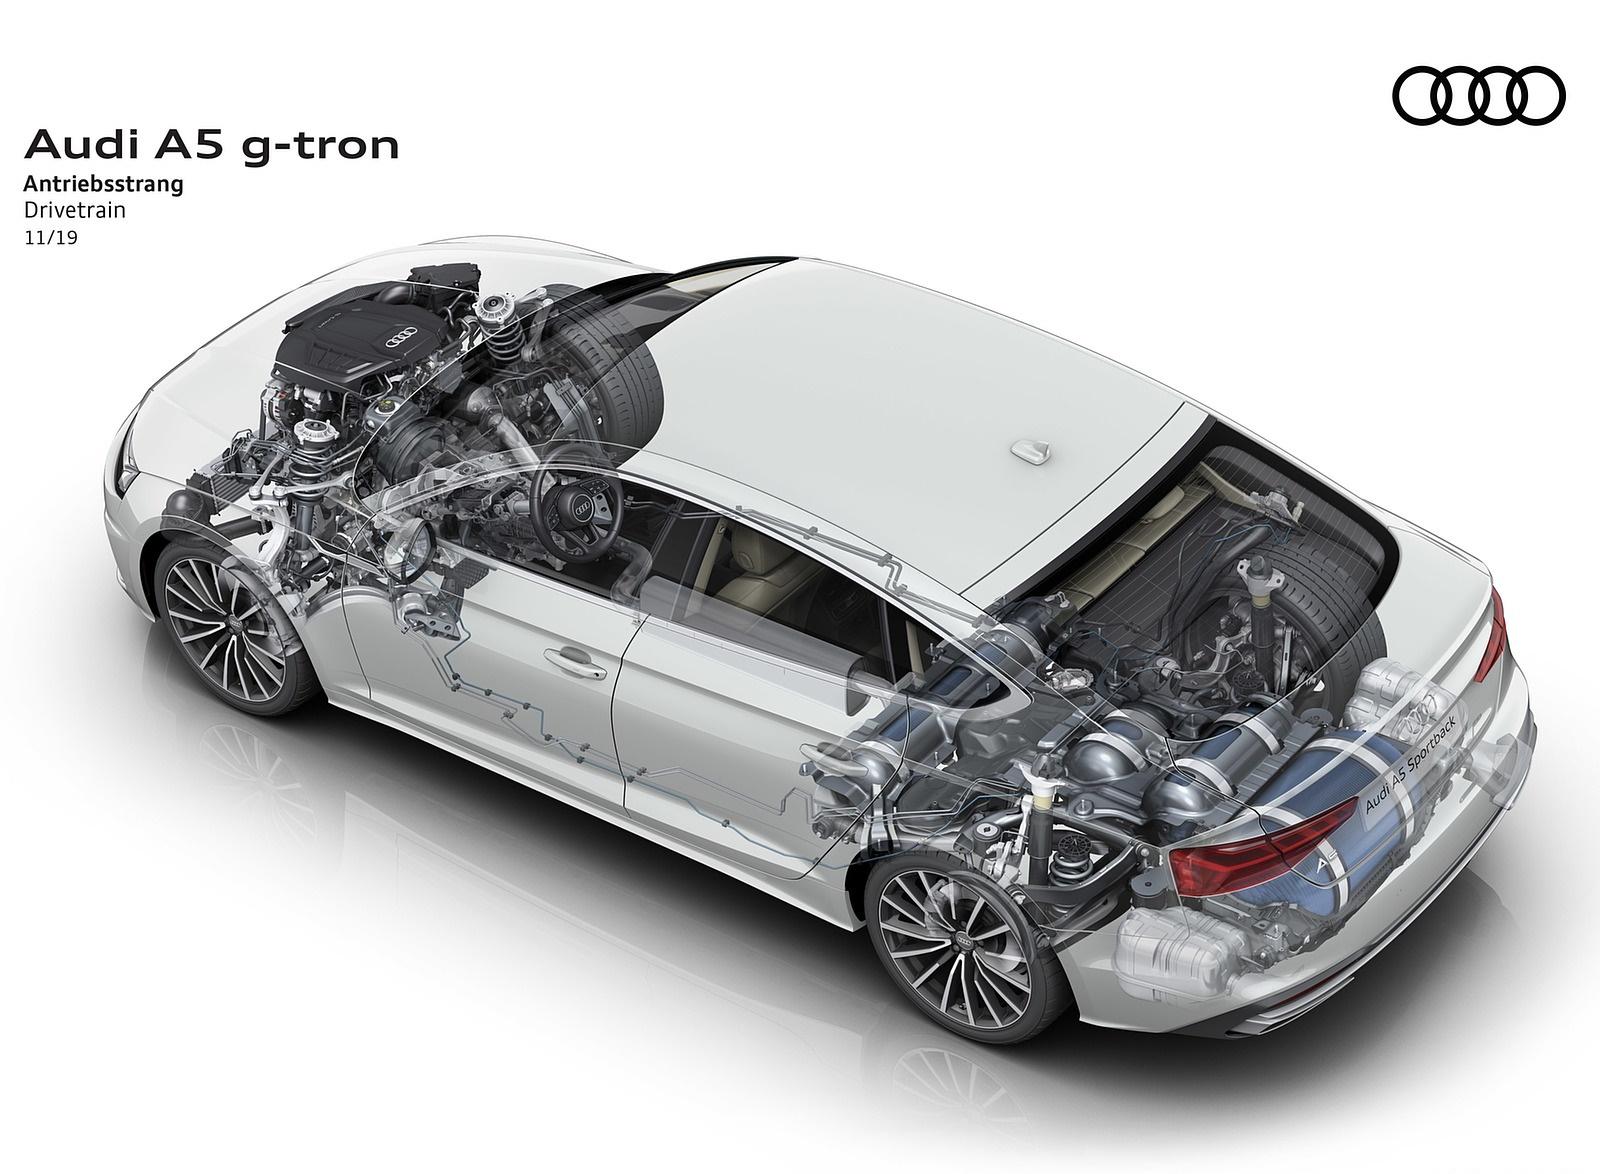 2020 Audi A5 Sportback g-tron Drivetrain Wallpapers (7)